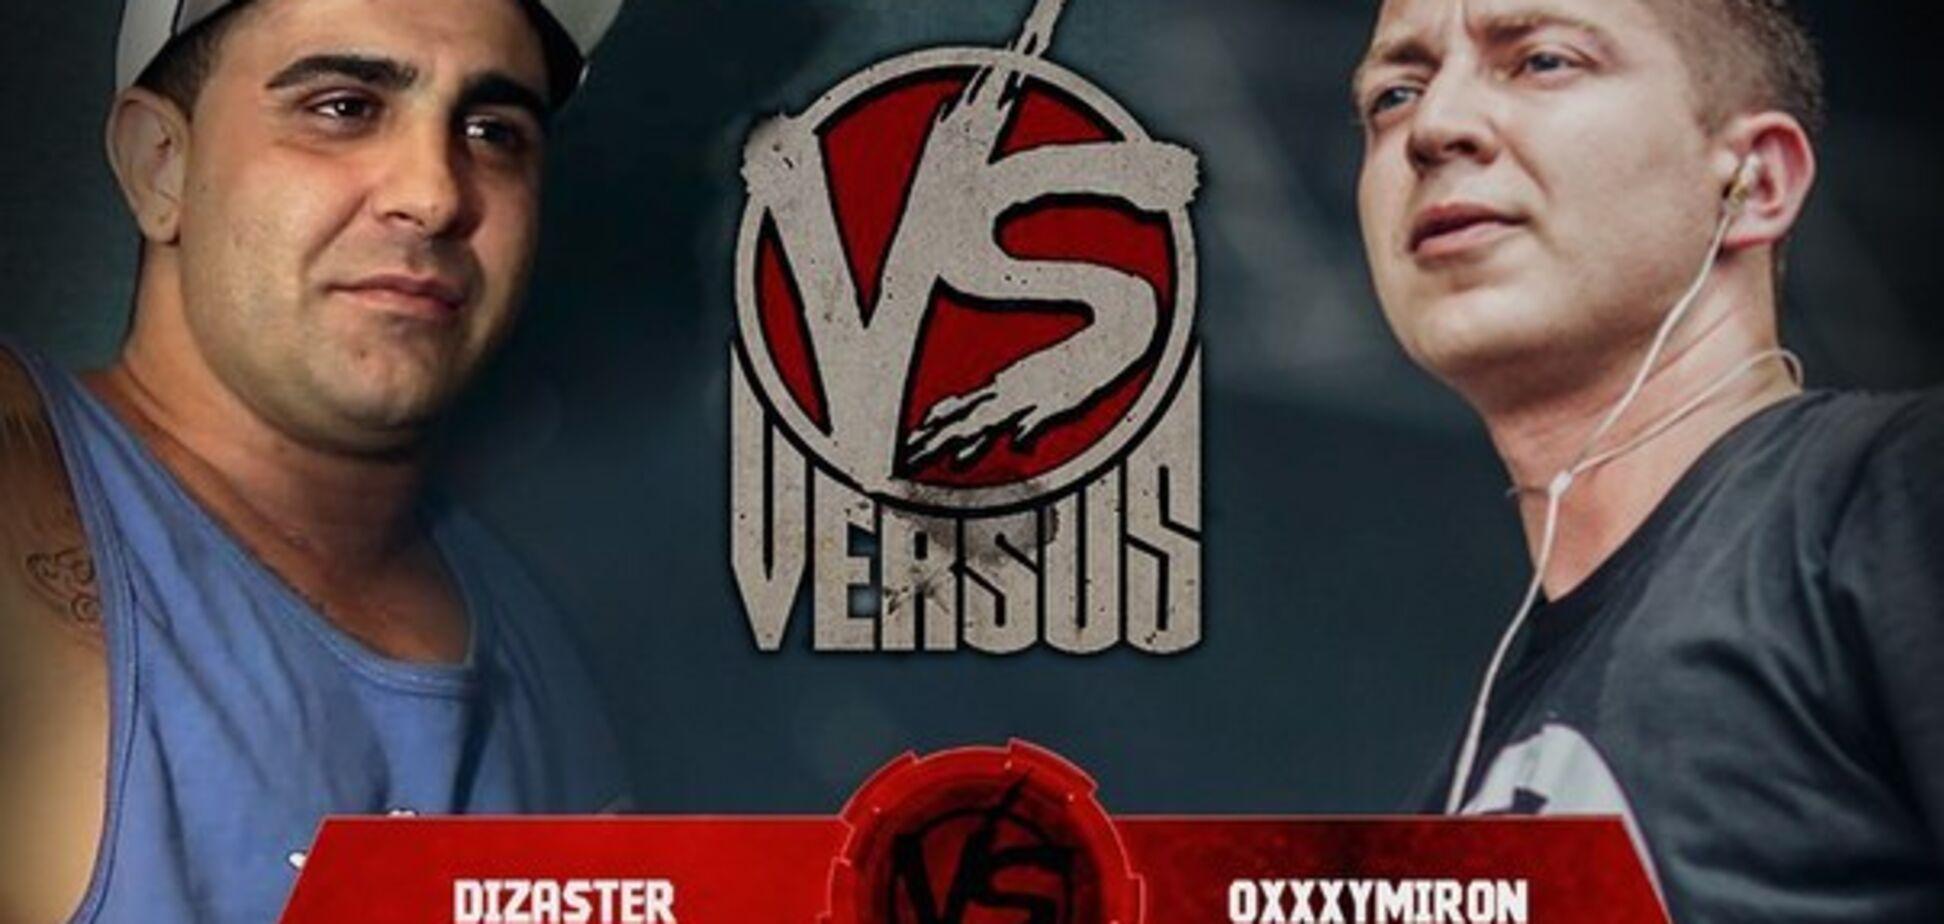 Оксімірон vs Дізастер: онлайн-трансляція реп-батла століття